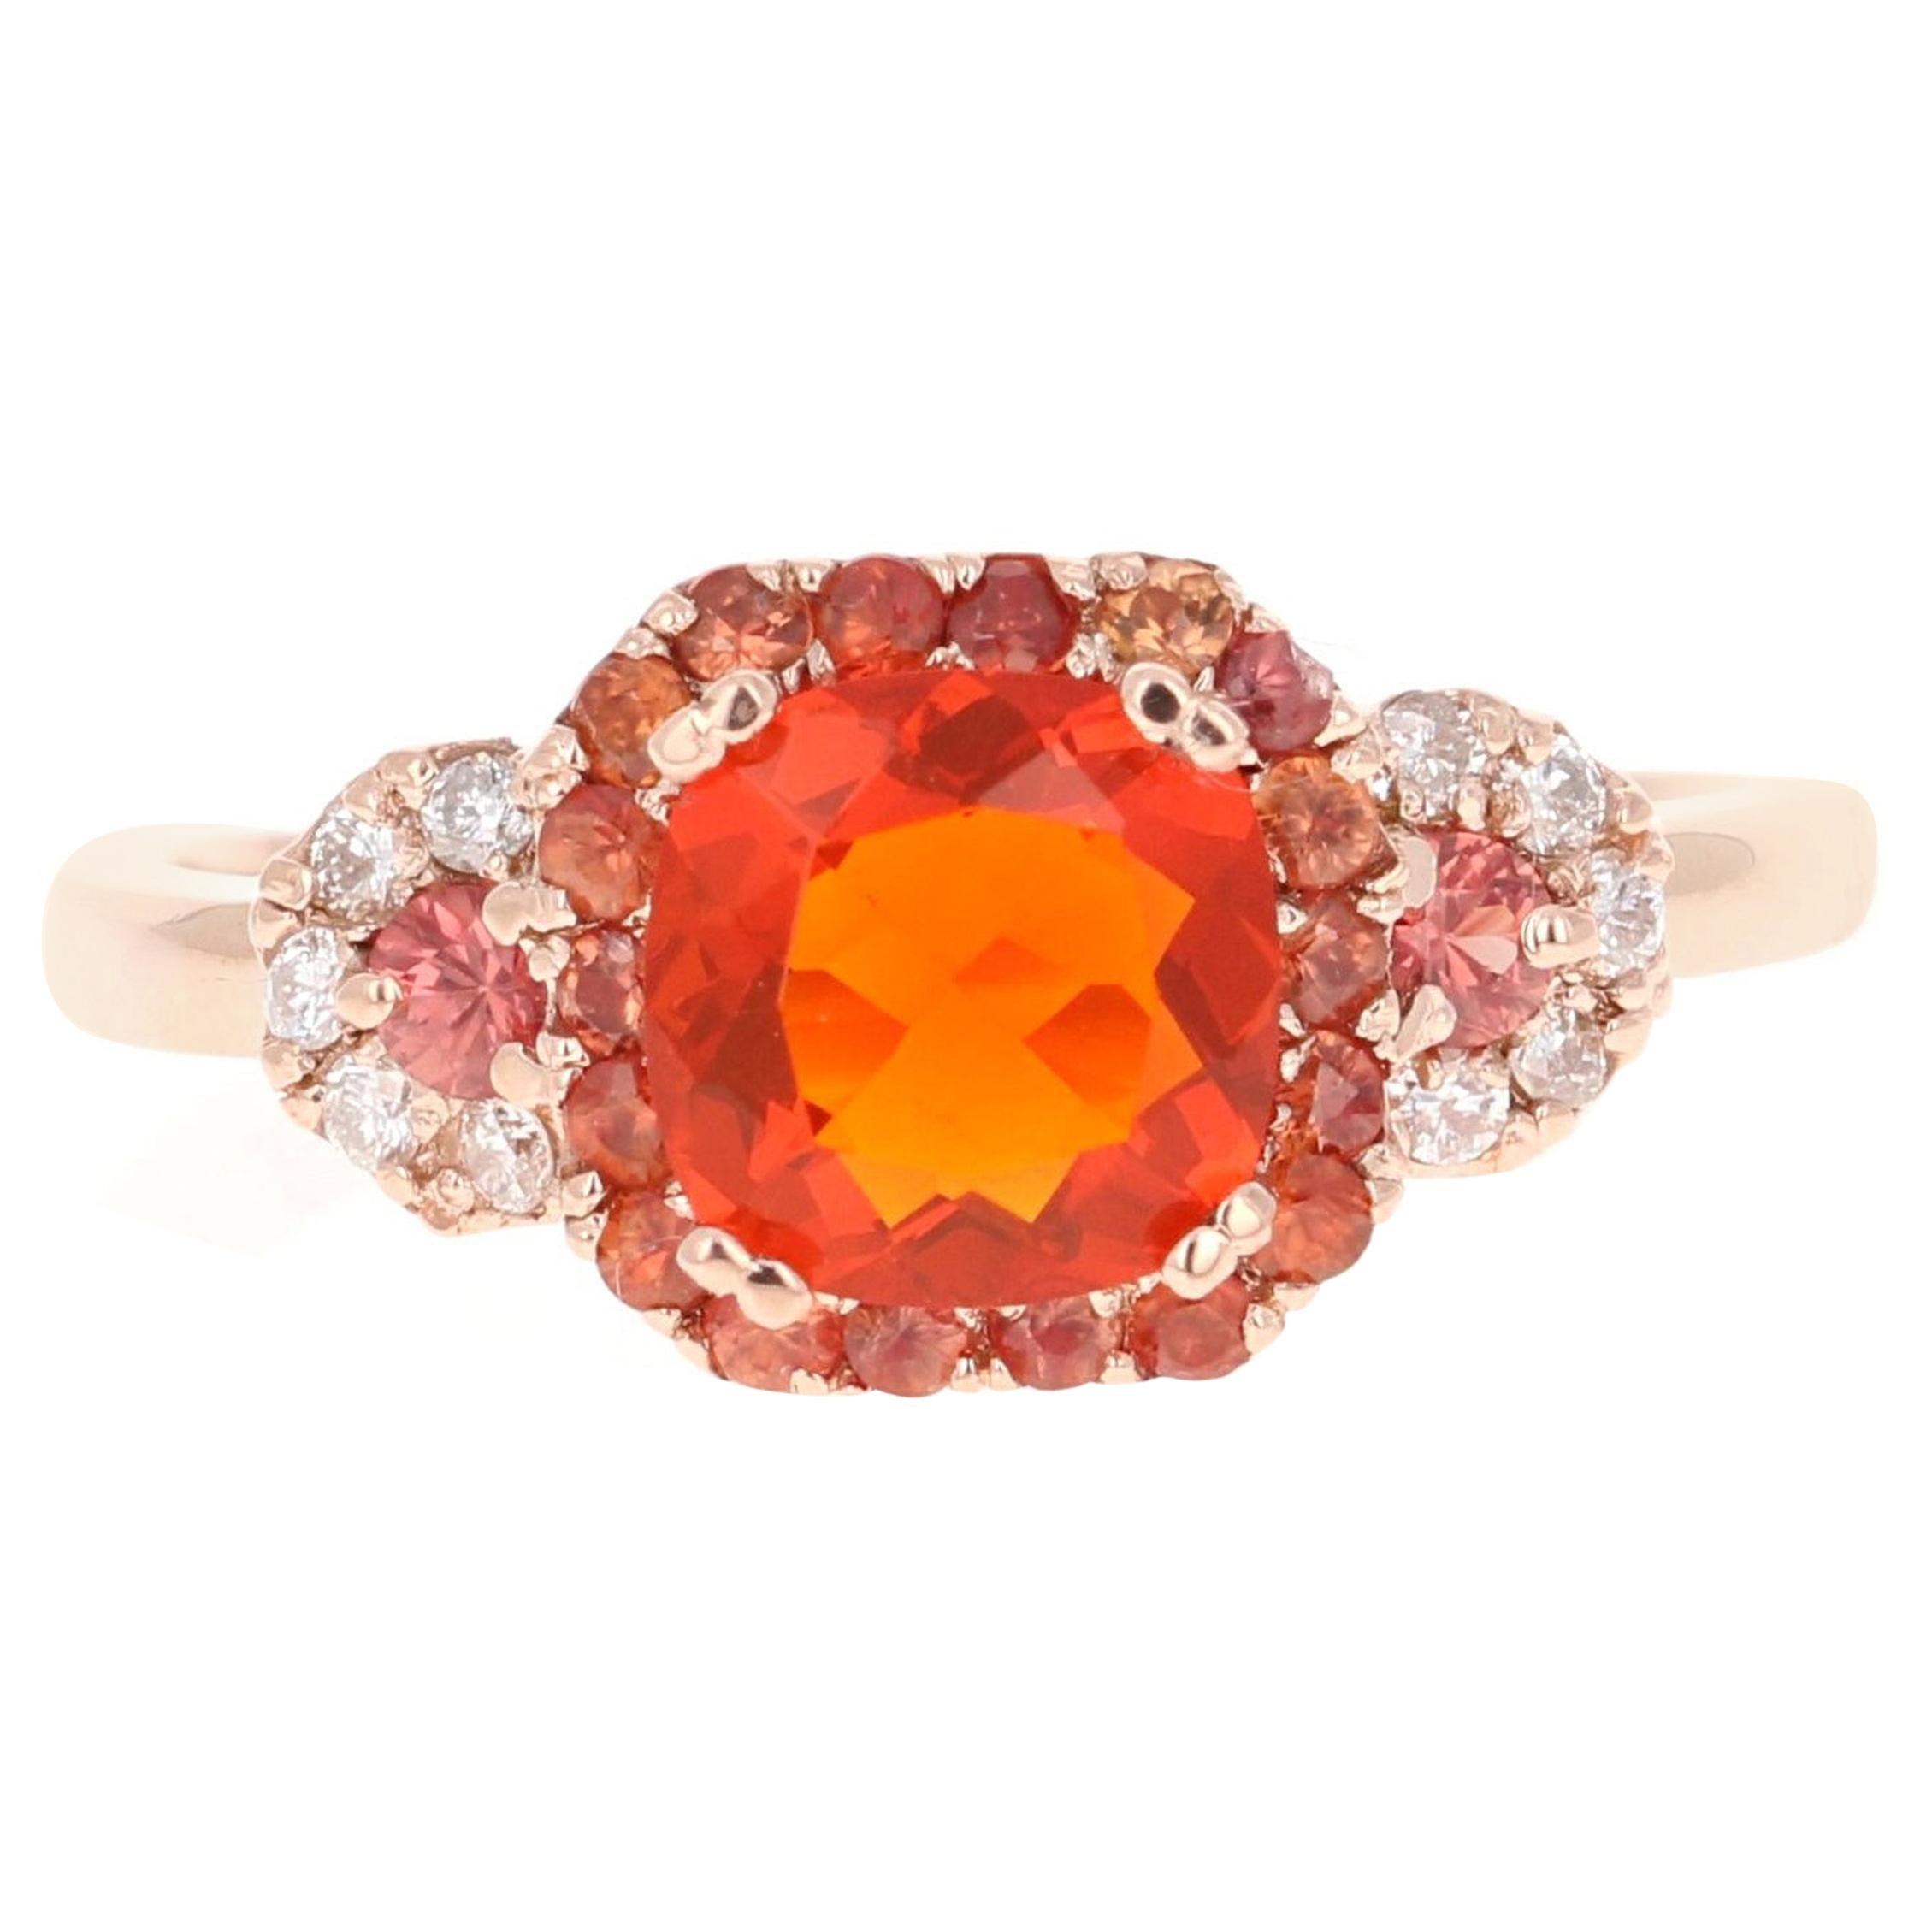 1.36 Carat Fire Opal Sapphire Diamond Rose Gold Engagement Ring